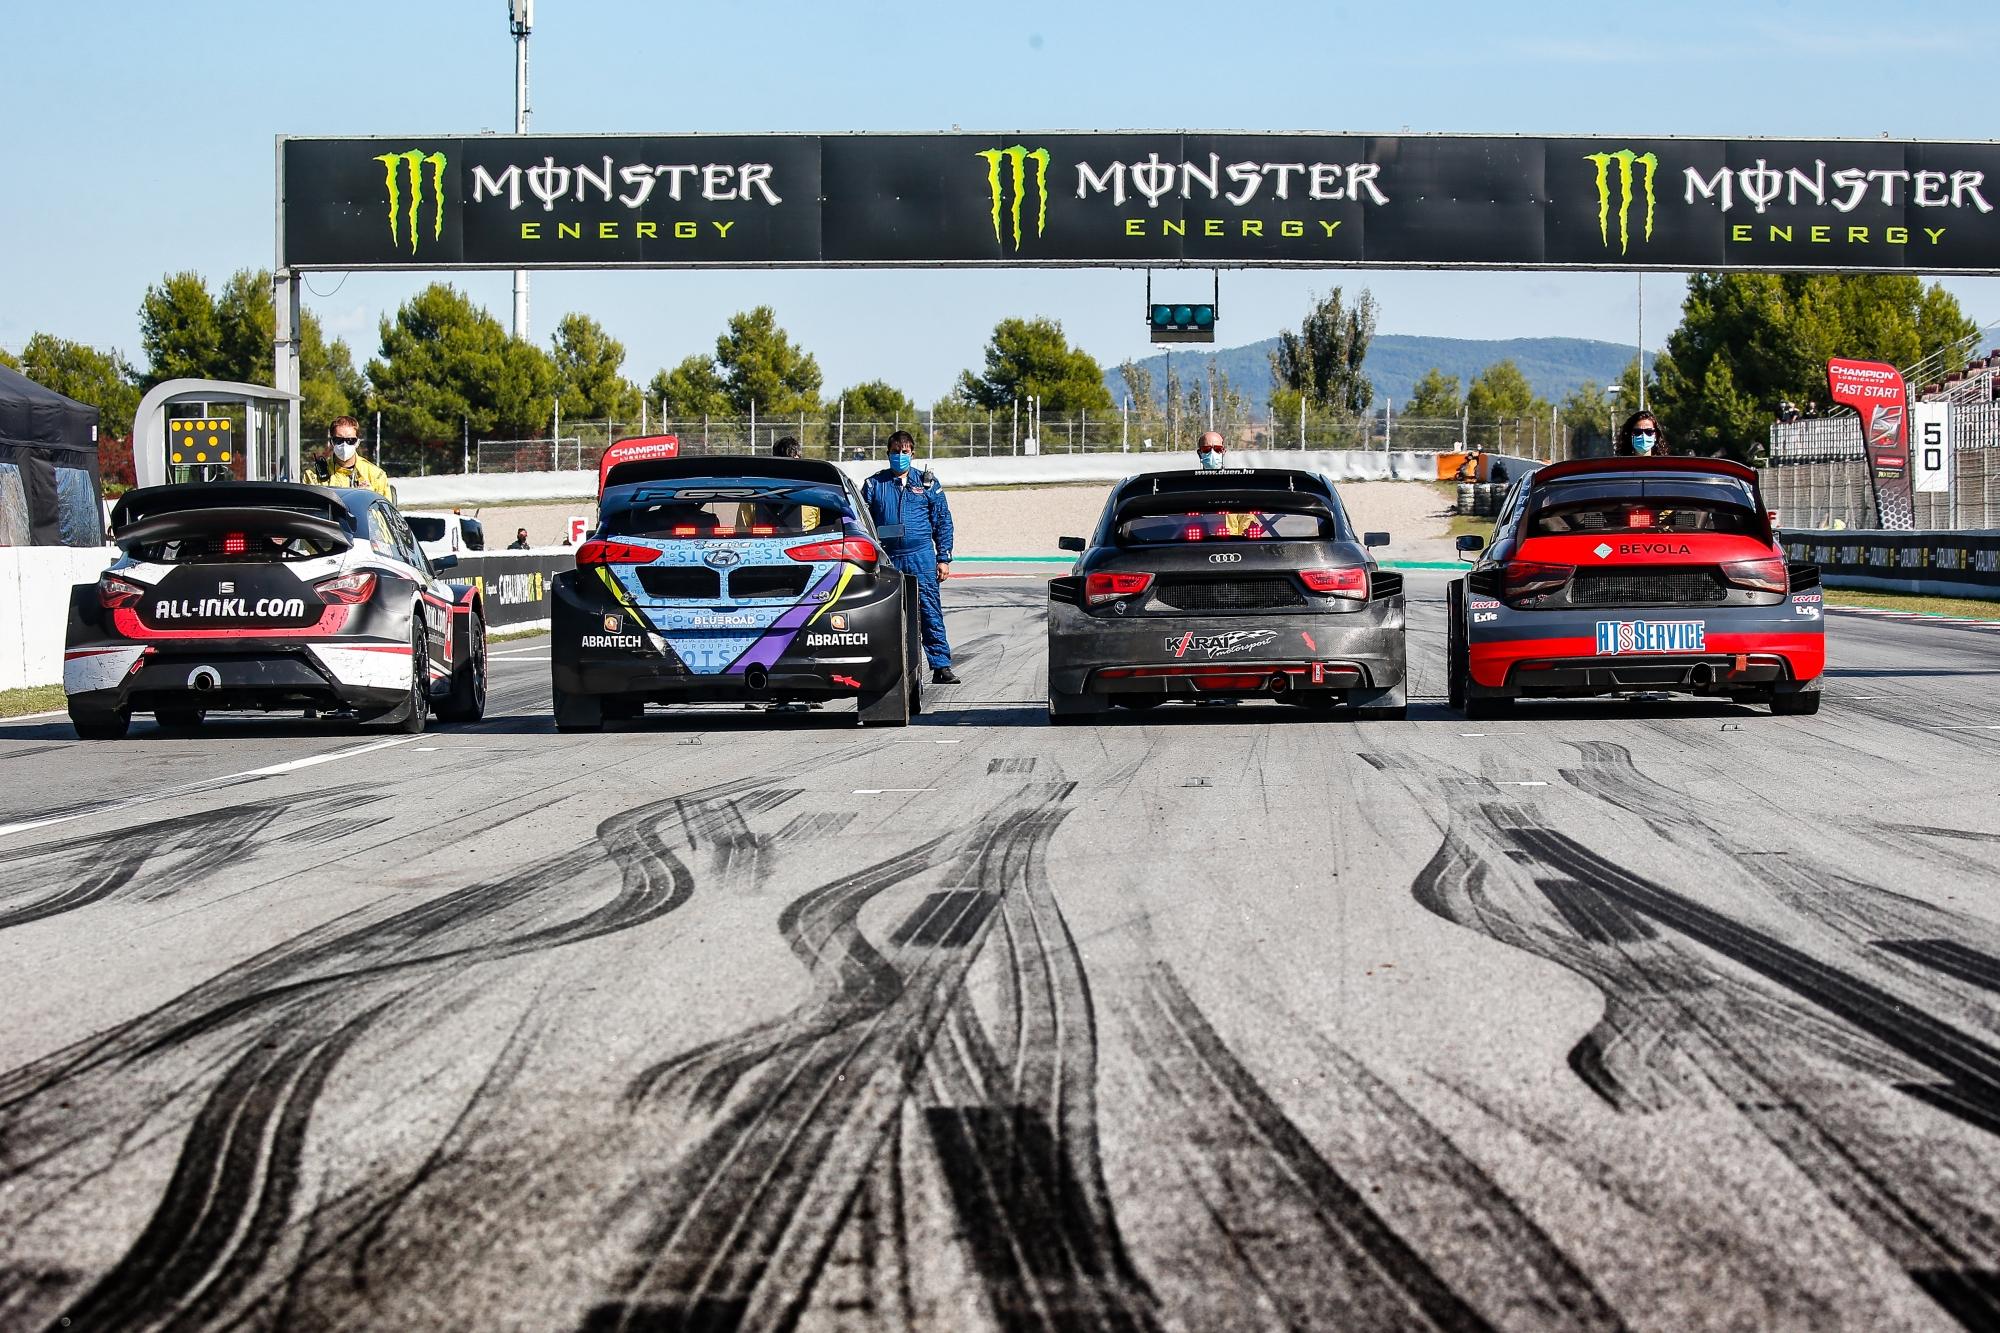 F1, WEC, WRC, WTCR, Rallycross (2021) : infos, calendriers, résultats